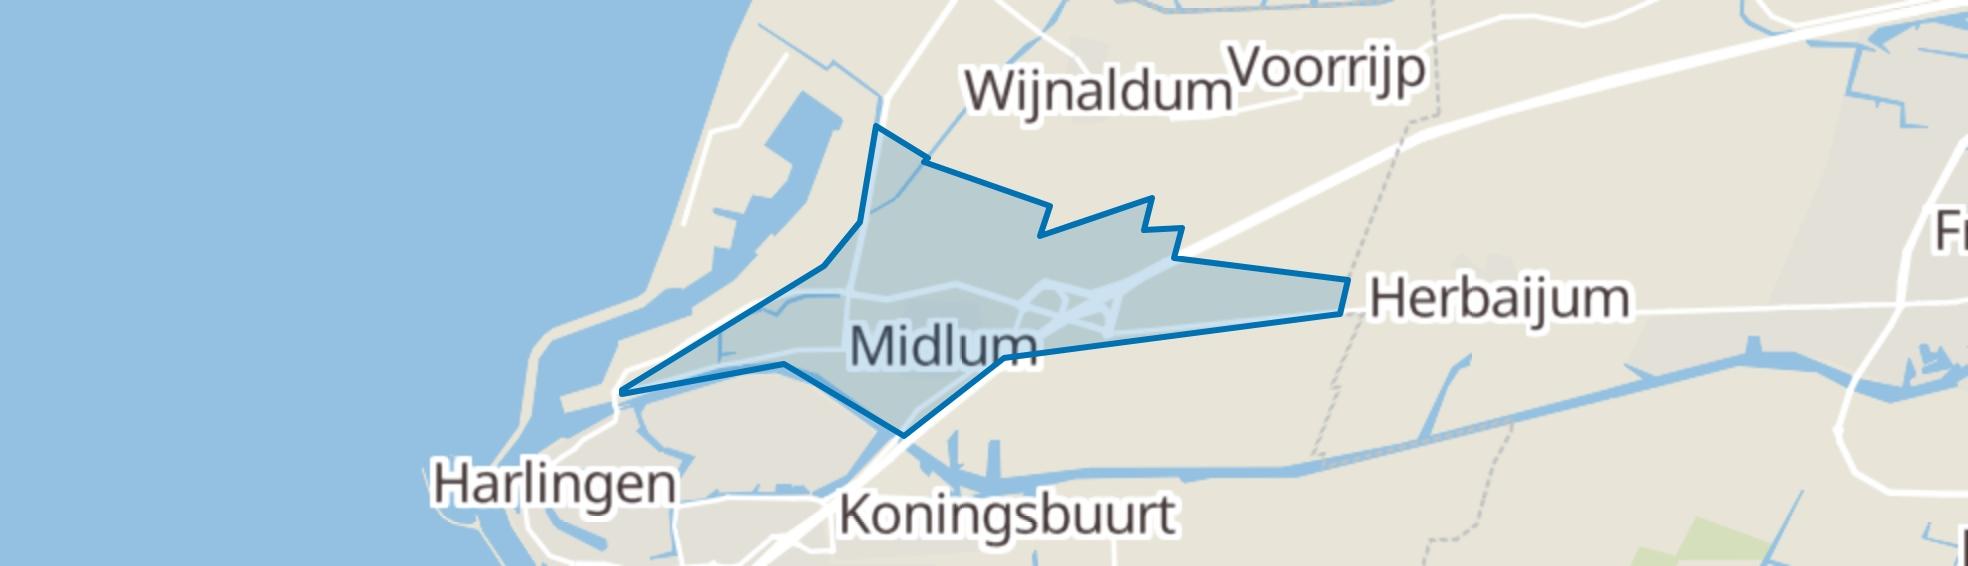 Midlum map